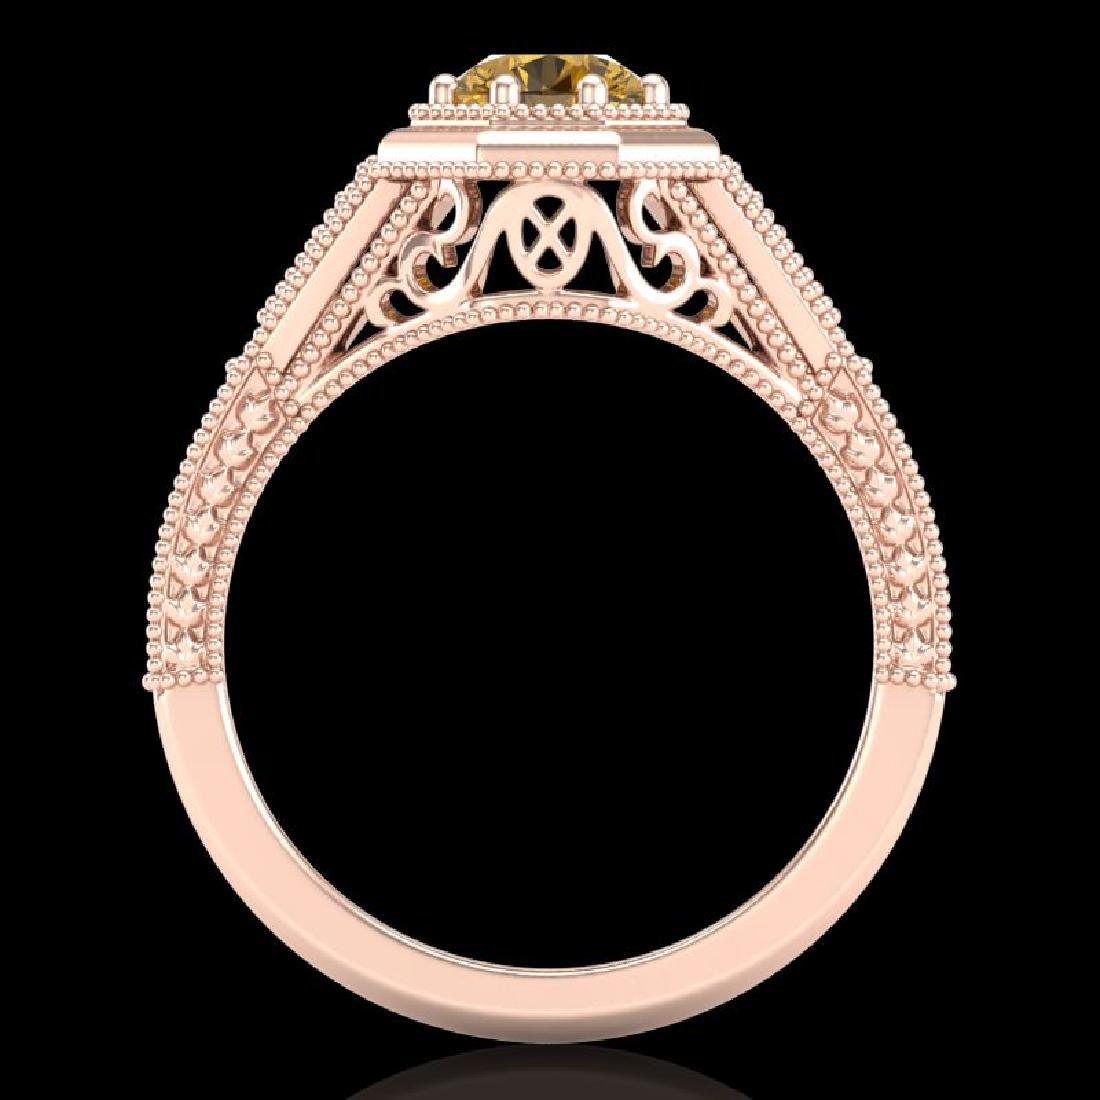 0.84 CTW Intense Fancy Yellow Diamond Engagement Art - 3